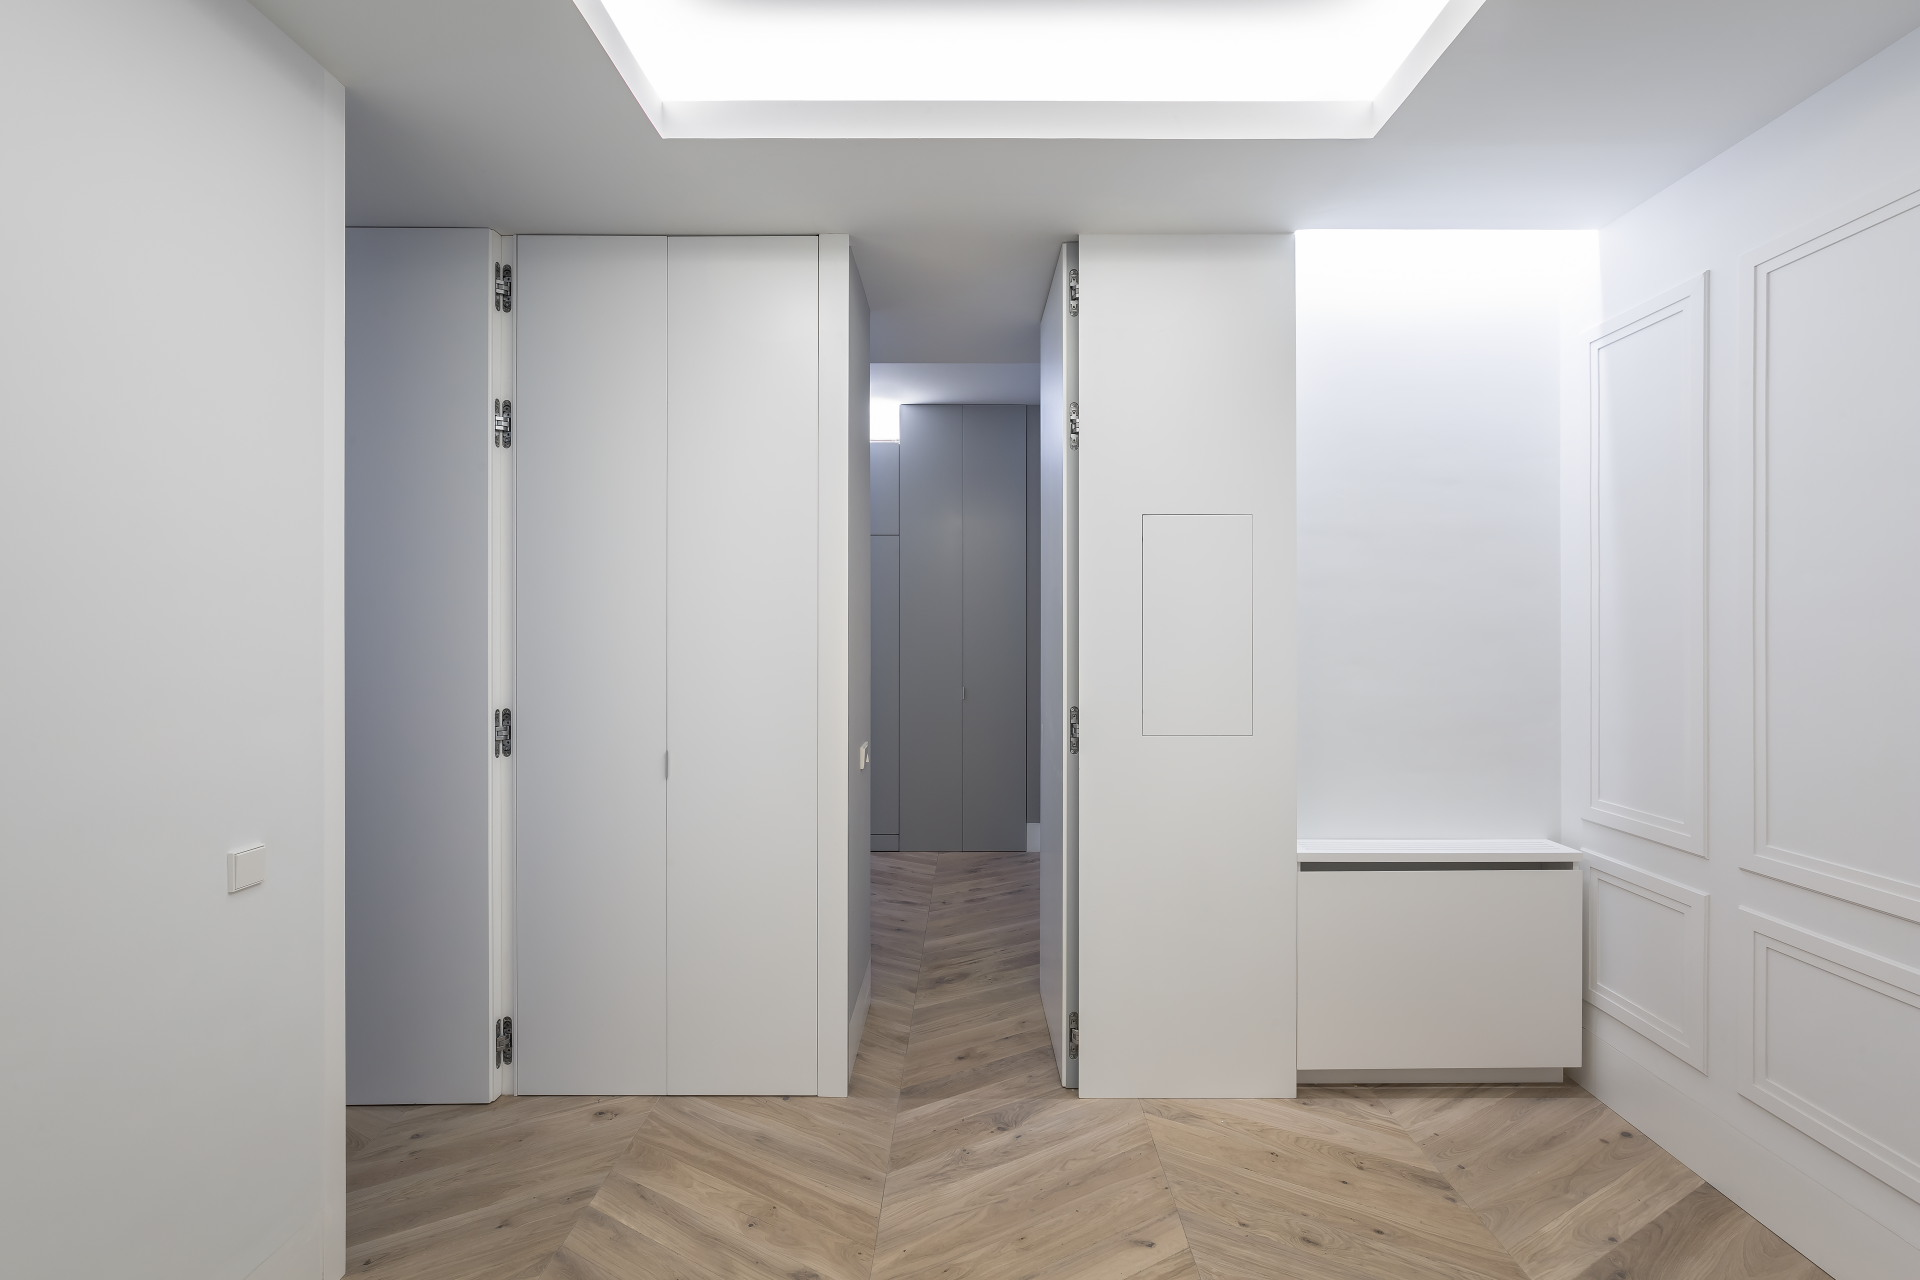 fotografia-arquitectura-valencia-german-cabo-gallardo-llopis-bfm-edificatoria-turia01 (3)